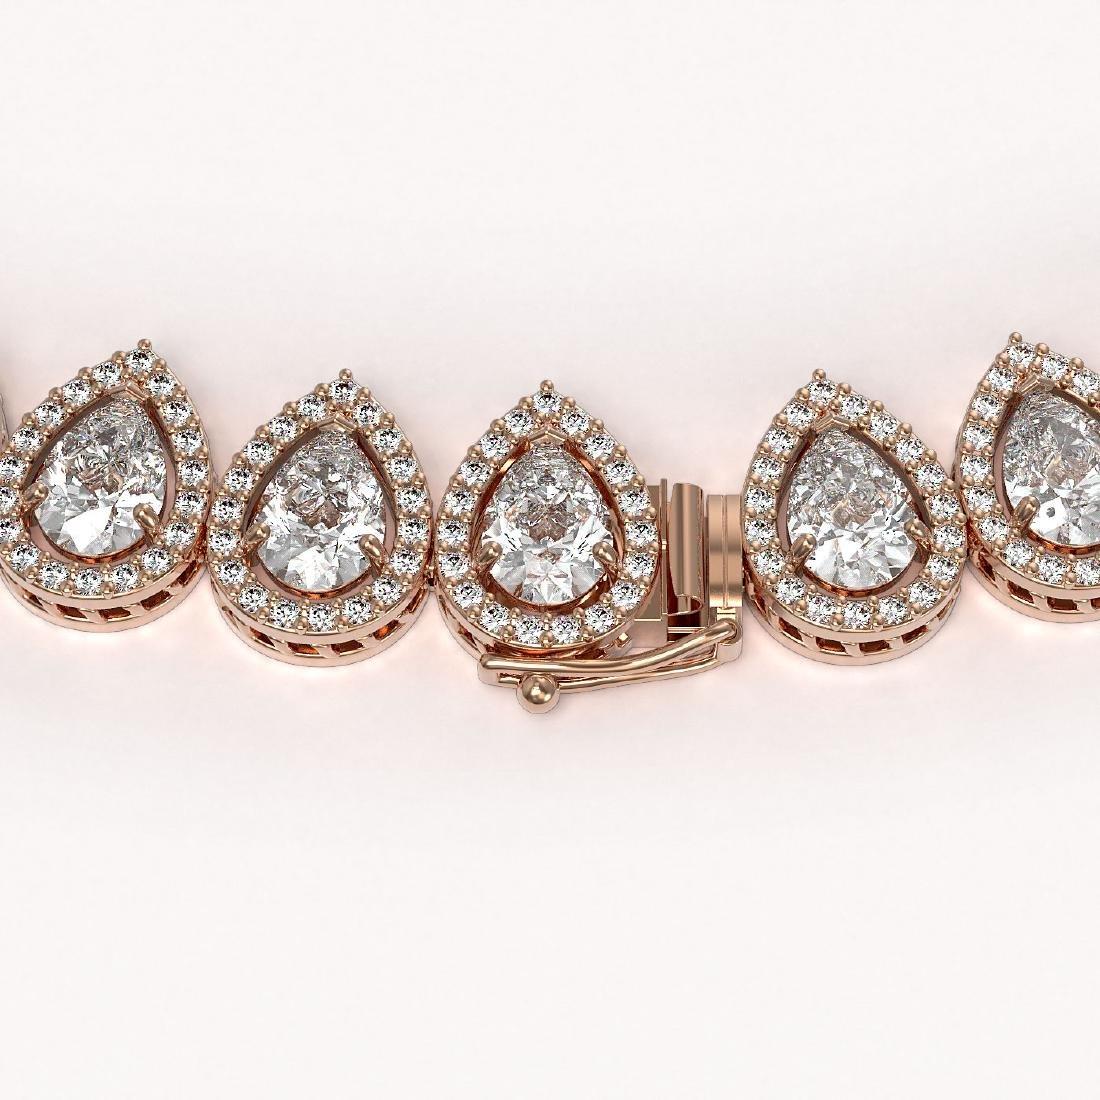 42.11 CTW Pear Diamond Designer Necklace 18K Rose Gold - 3